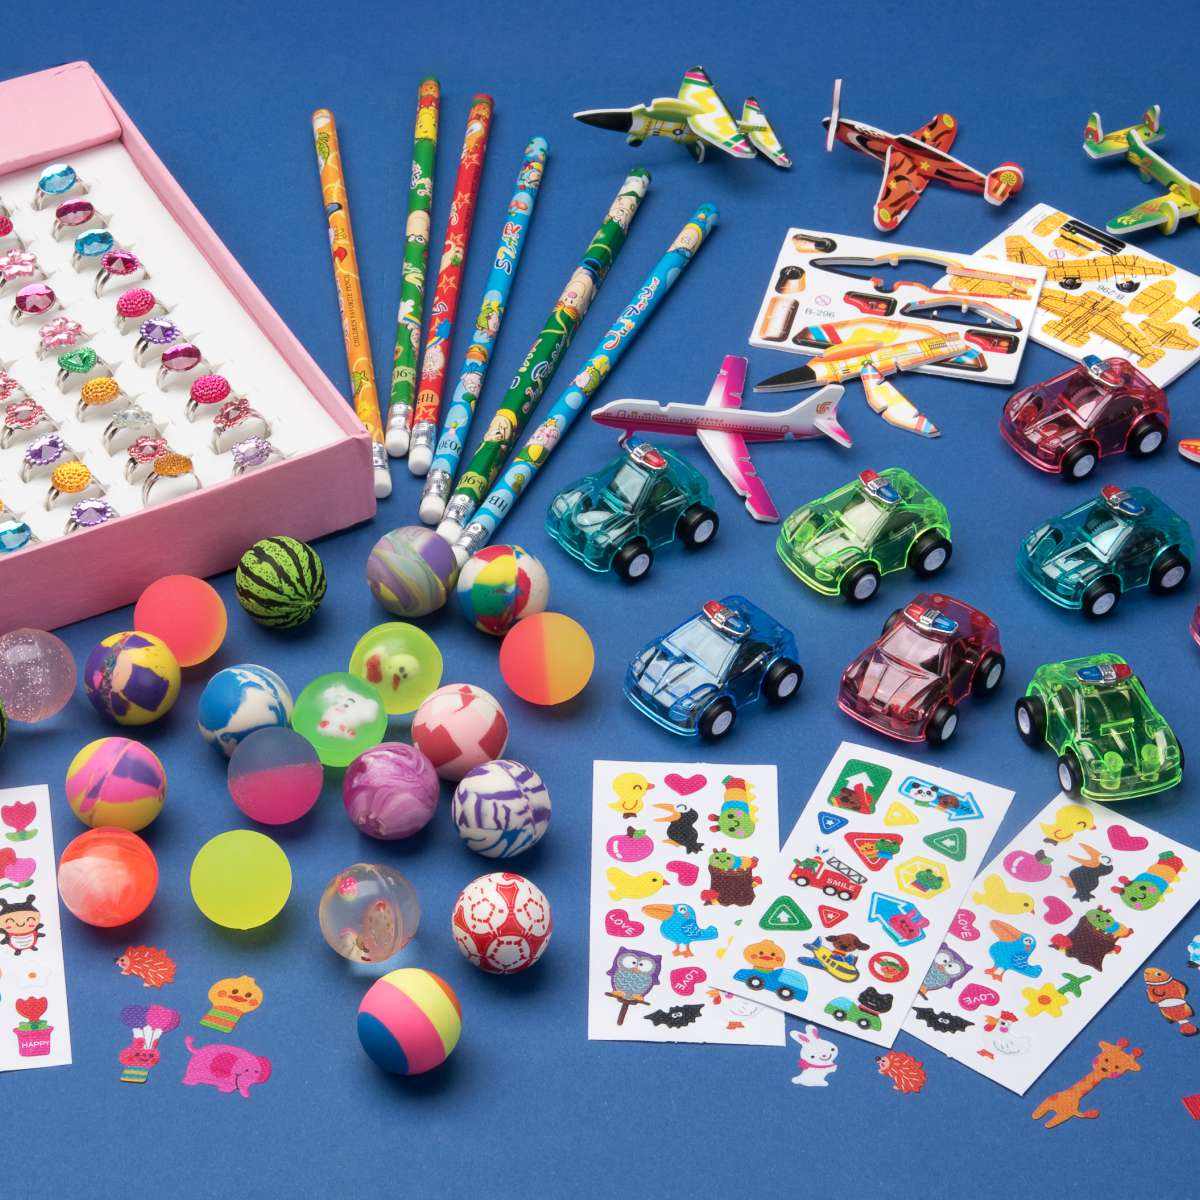 Spielzeugsortiment